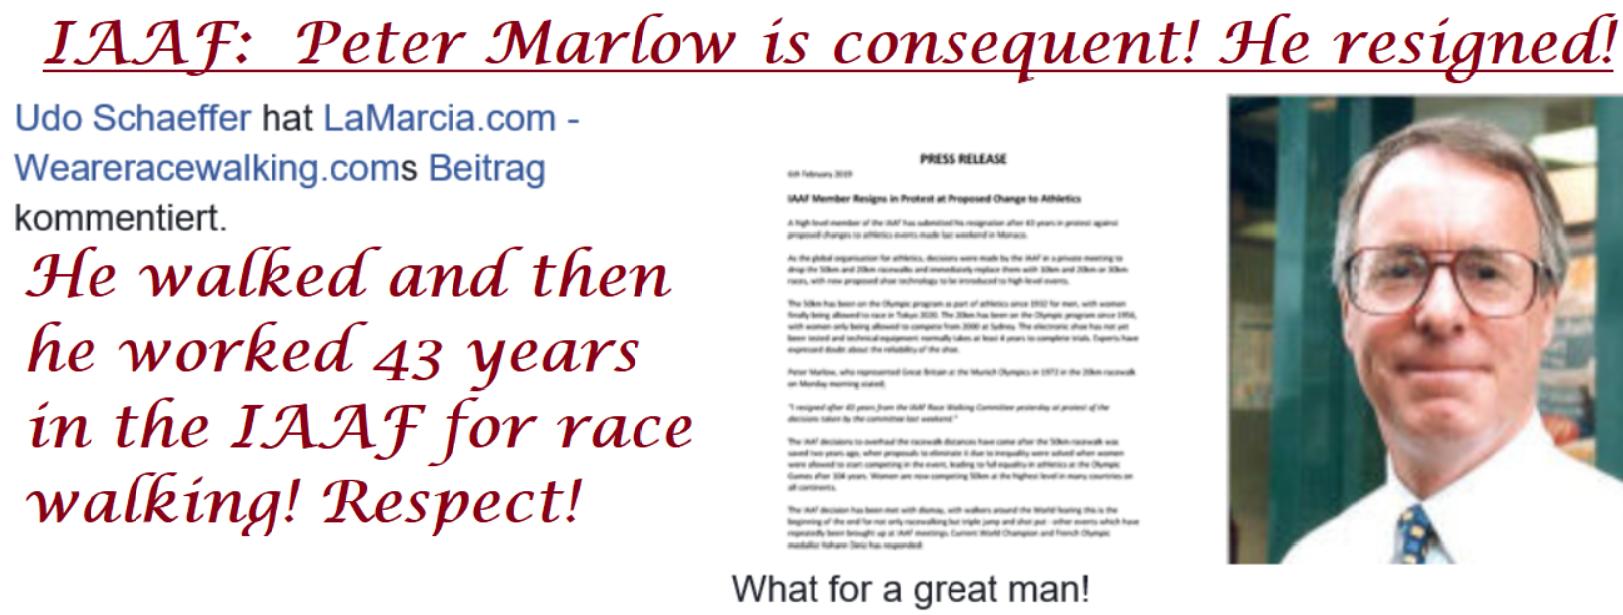 P. Marlow